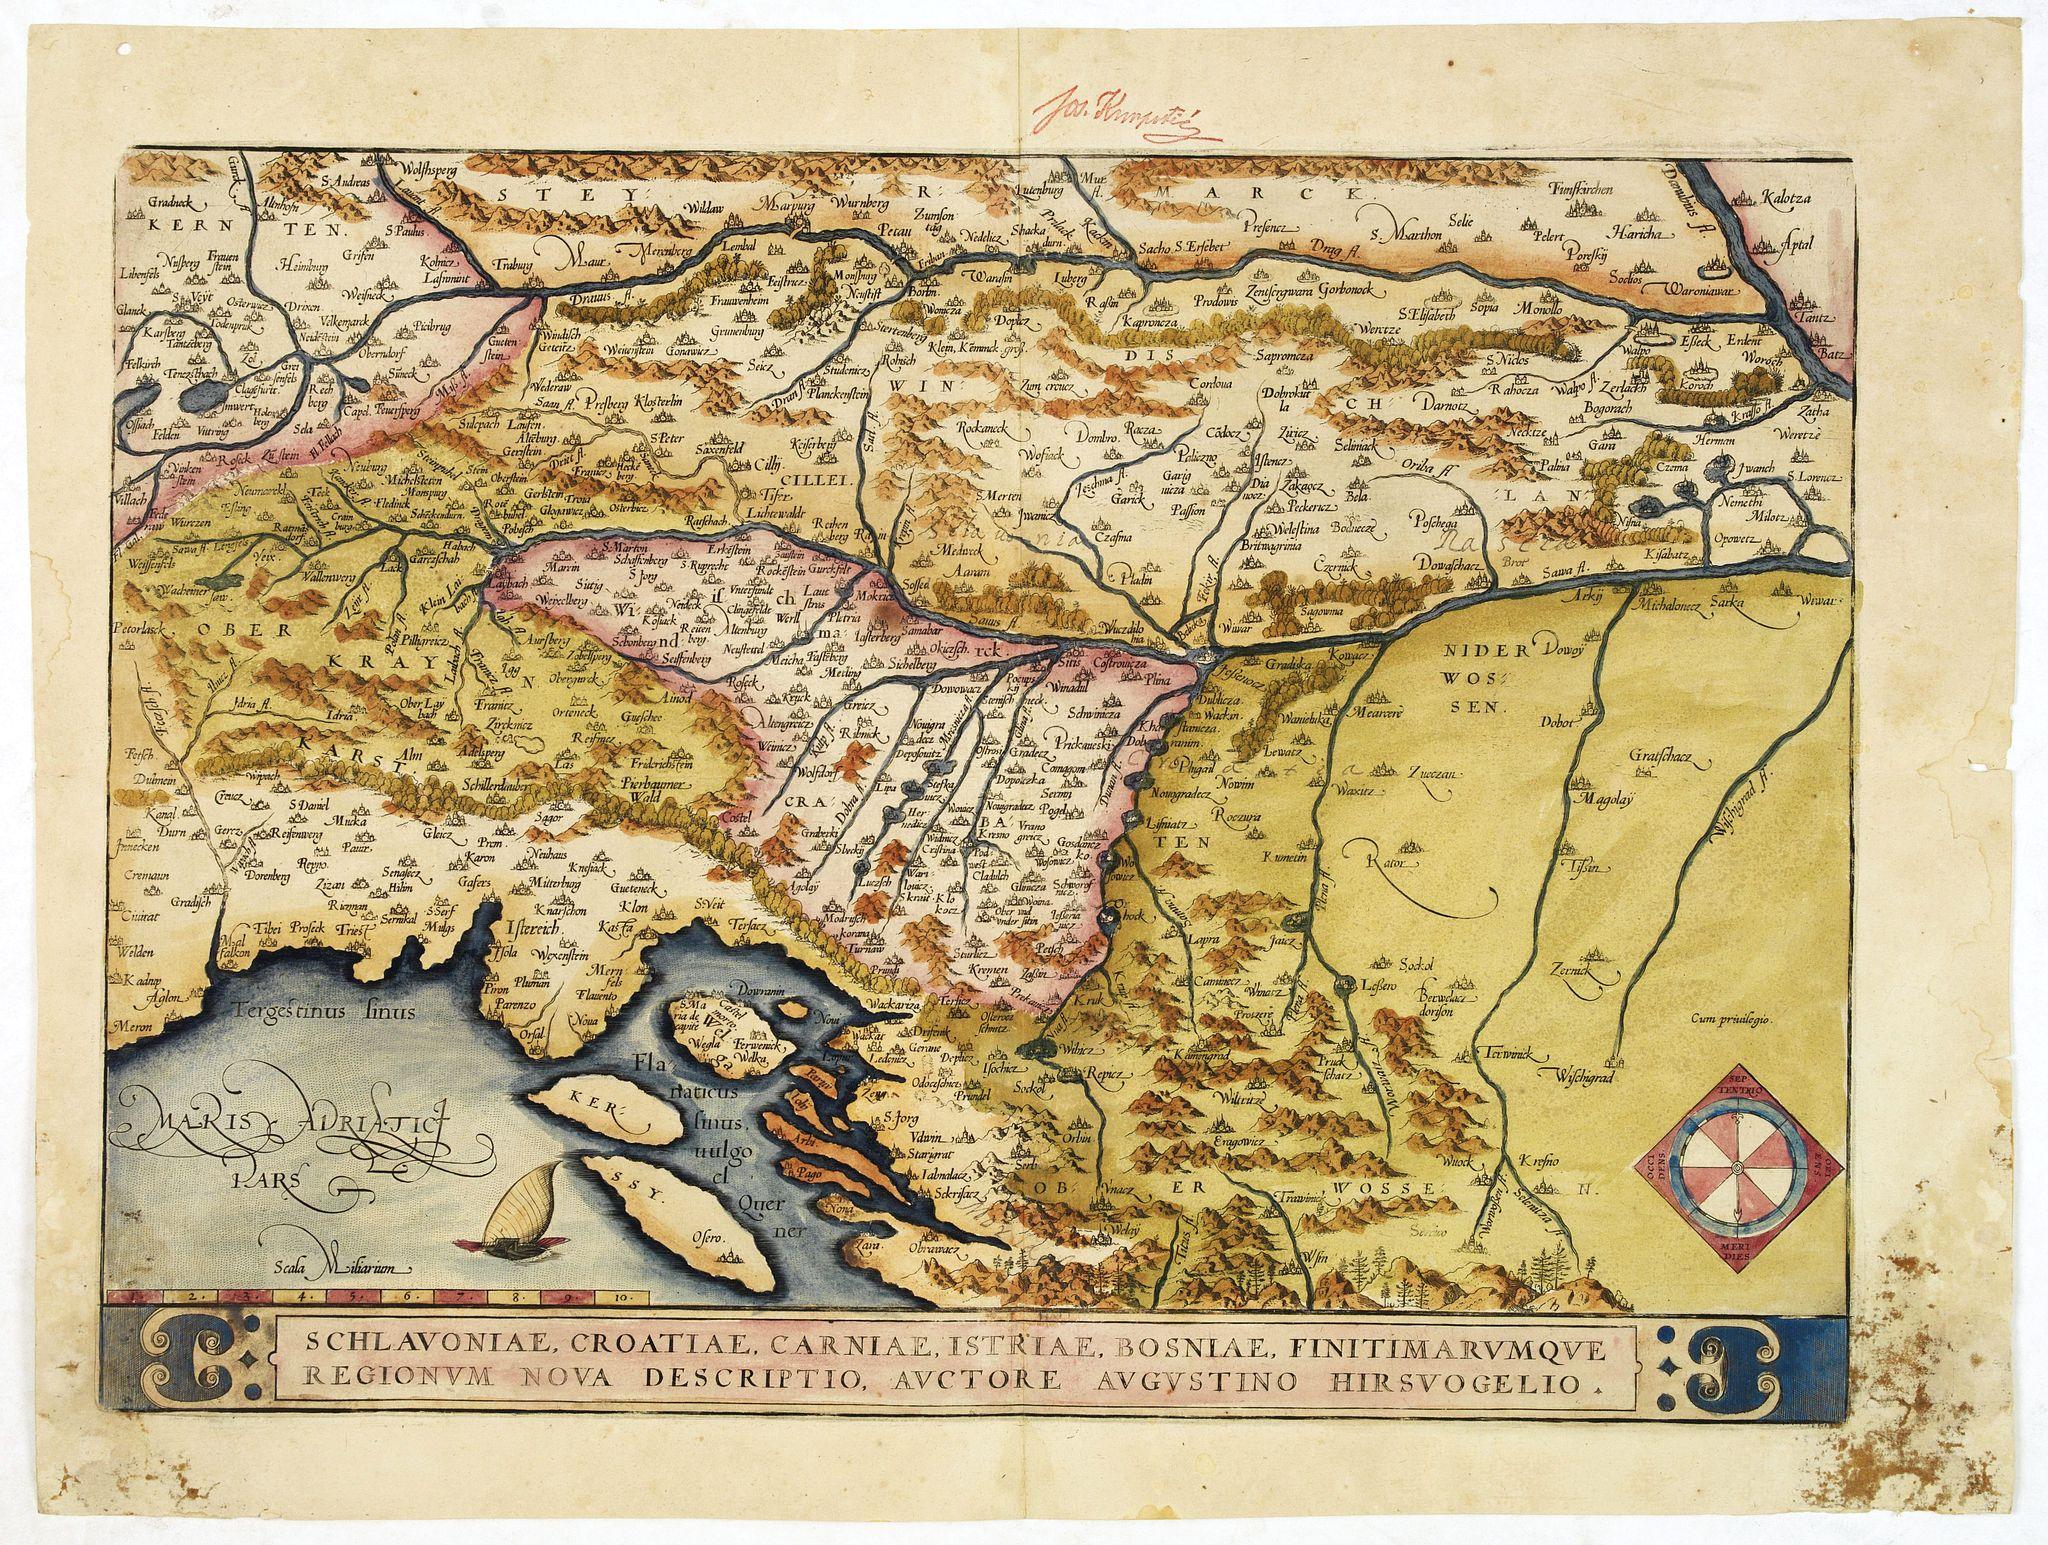 ORTELIUS, A. -  Schlavoniae, Croatiae, Carniale.. Bosniae. . .